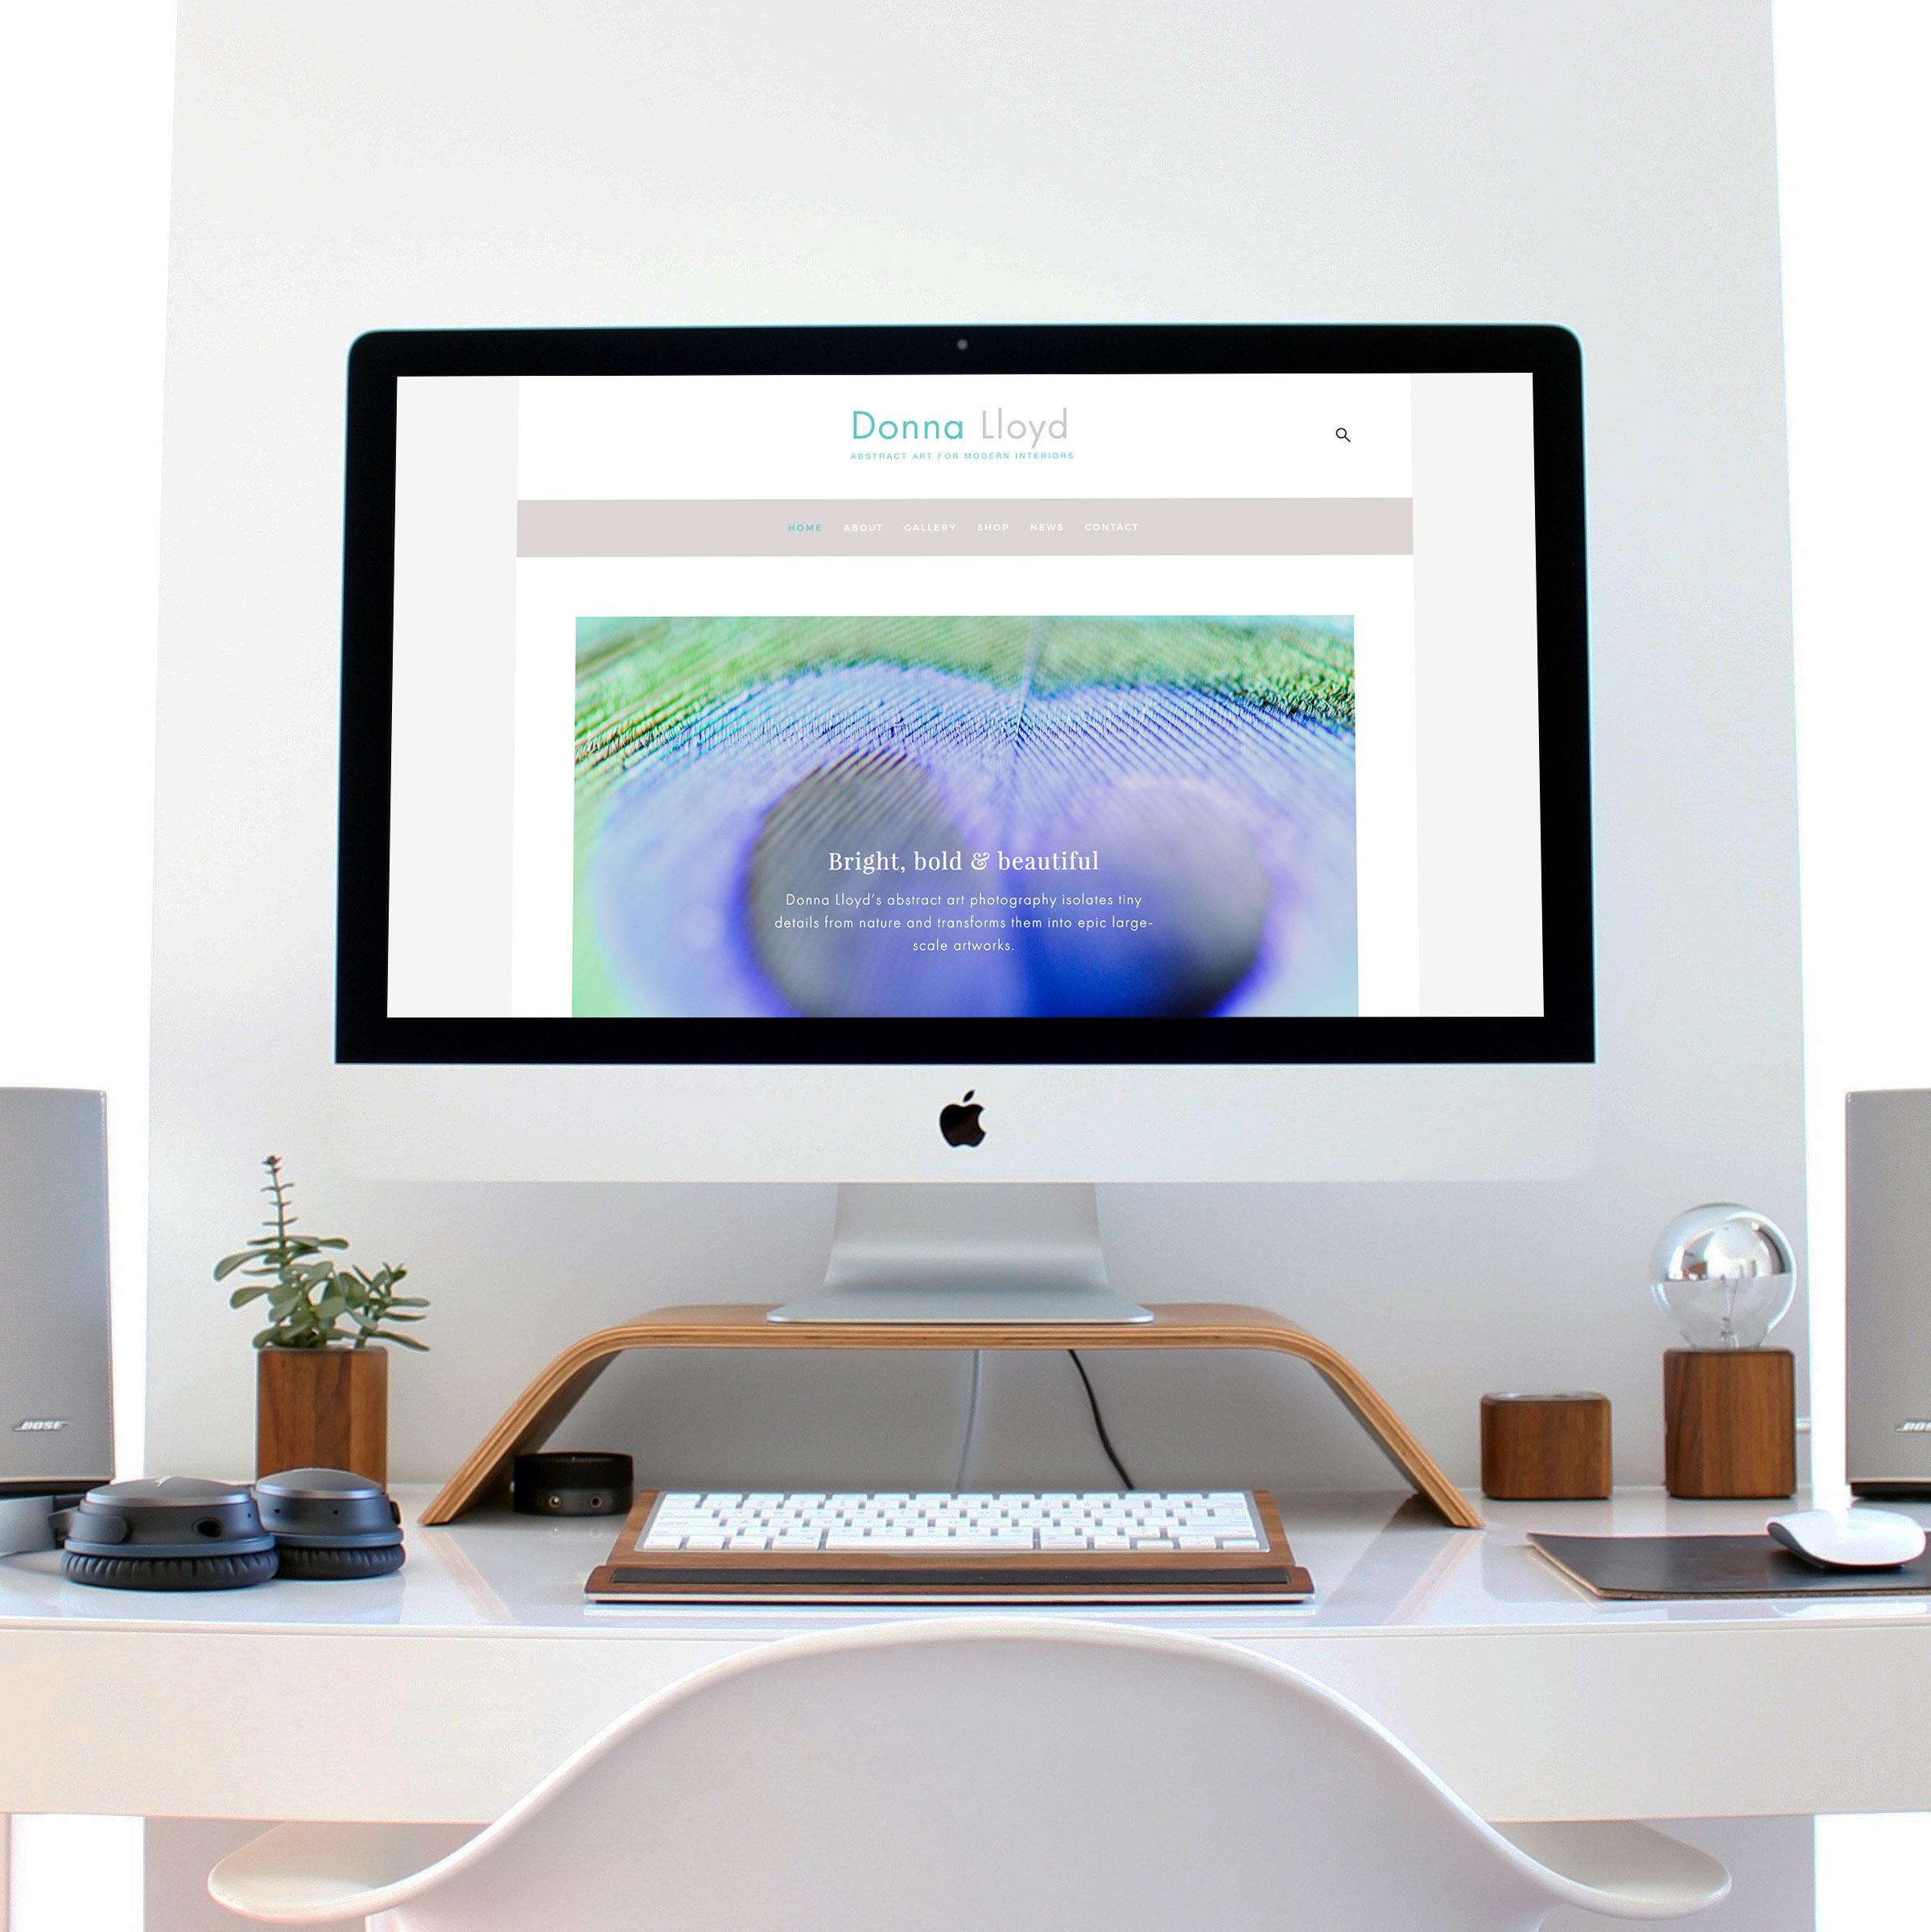 donnalloyd-website-photoshop.jpg